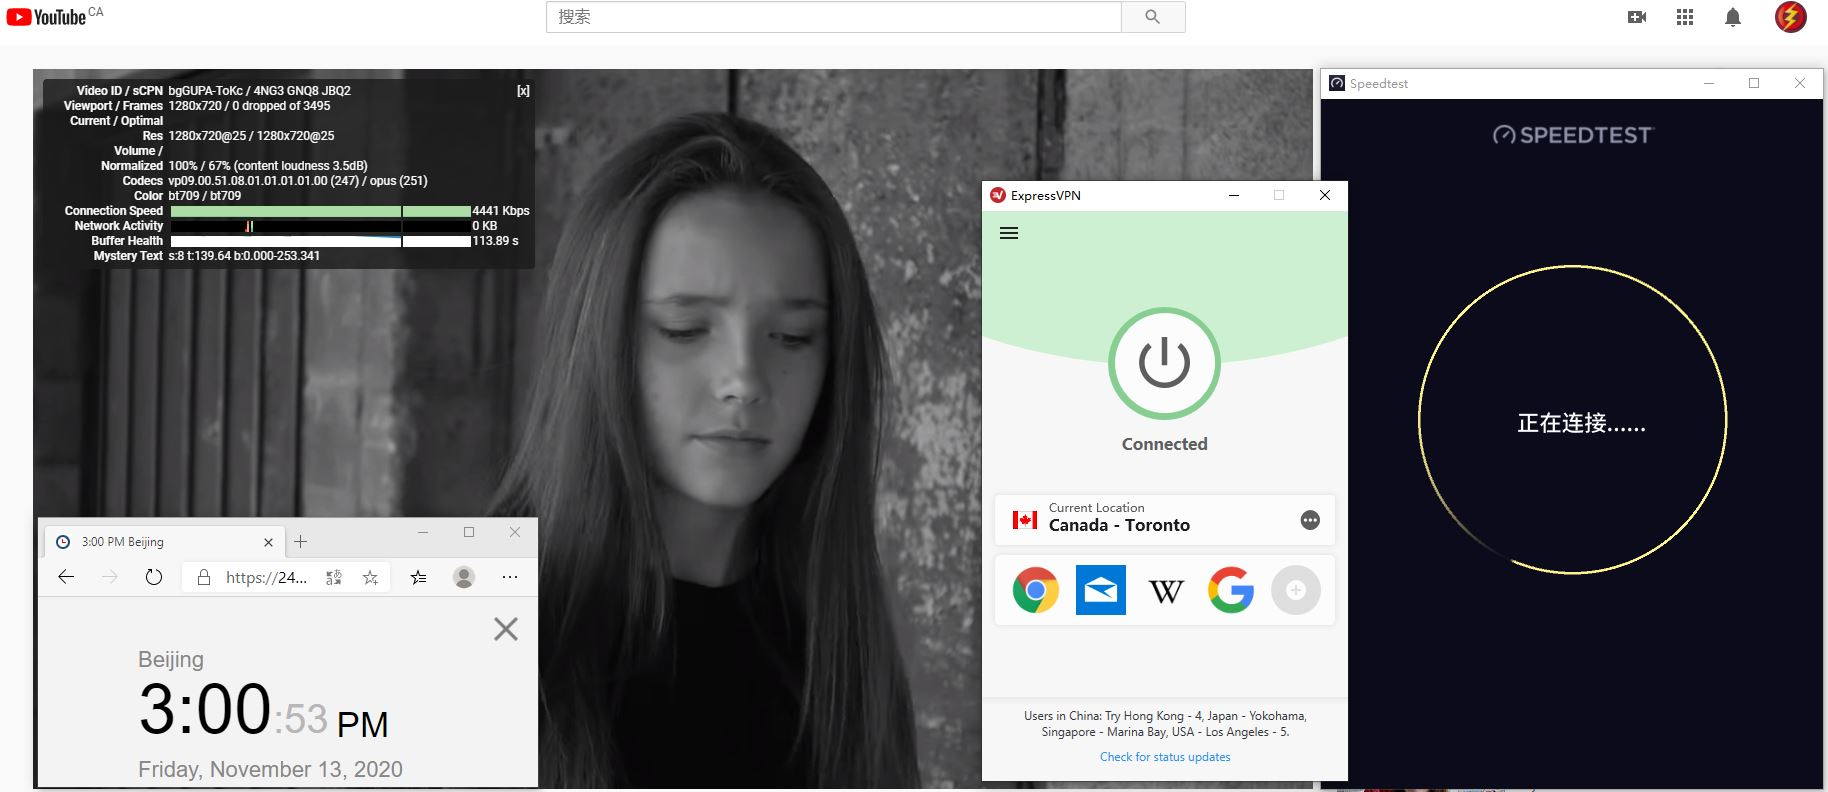 Windows10 ExpressVPN IKEv2 Canada - Toronto 服务器 中国VPN 翻墙 科学上网 测试 - 20201113